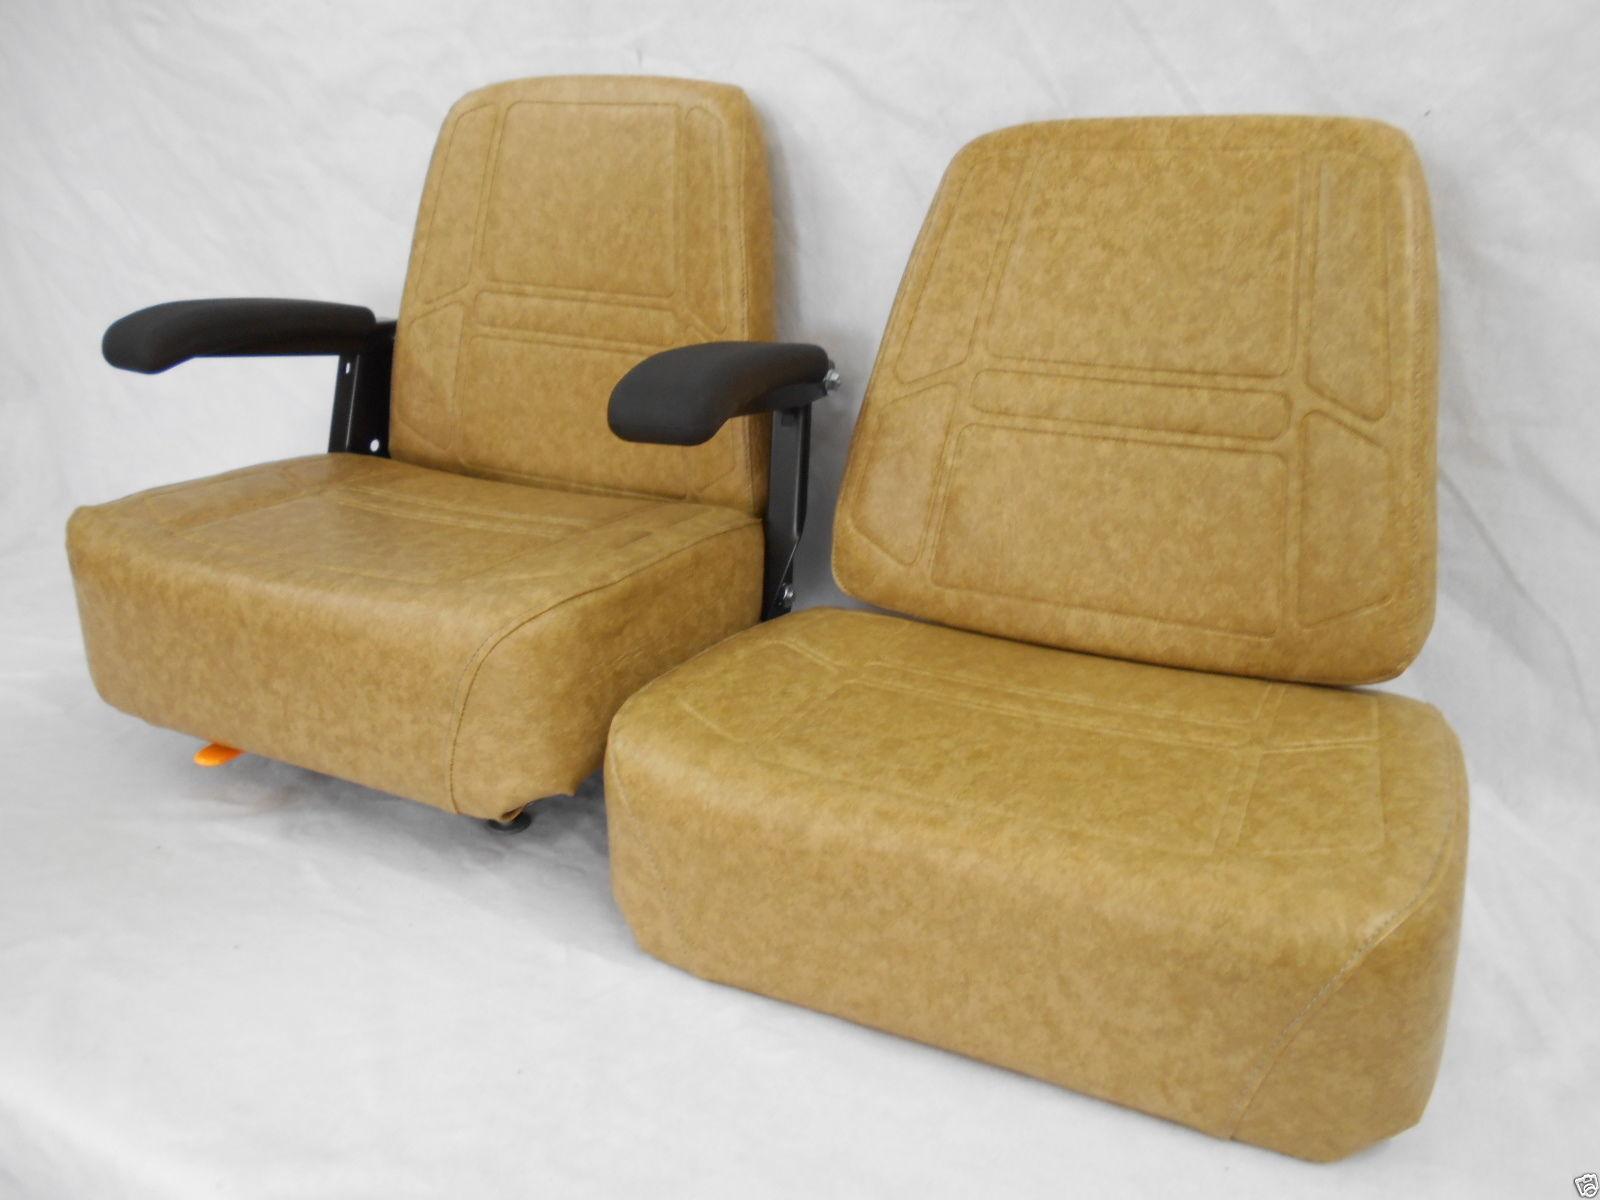 SCAG-BROWN-REPLACEMENT-SEAT-CUSHION-SET-ZERO-TURN-MOWERSEXTRA-THICK-BOTTOM-ZA-151621839250